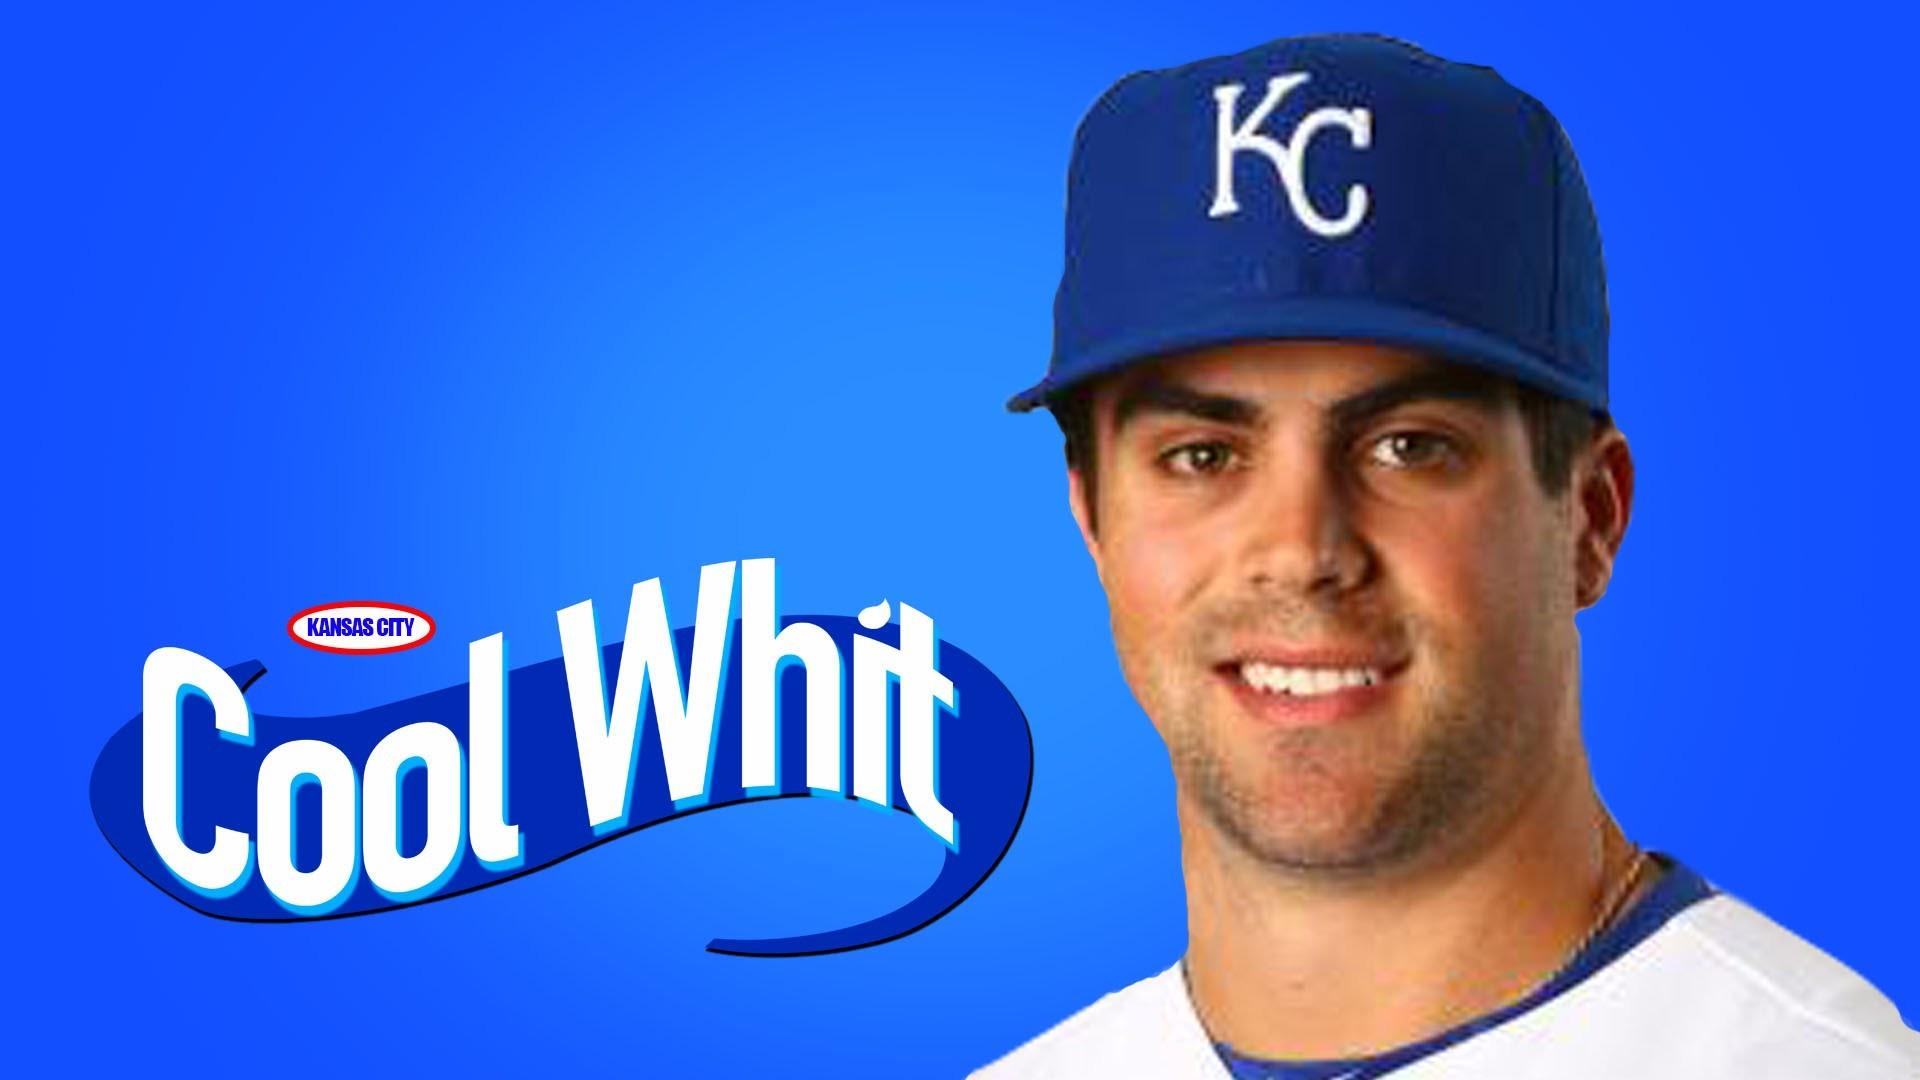 COOL WHIT | KC Royals Whit Merrifield – YouTube